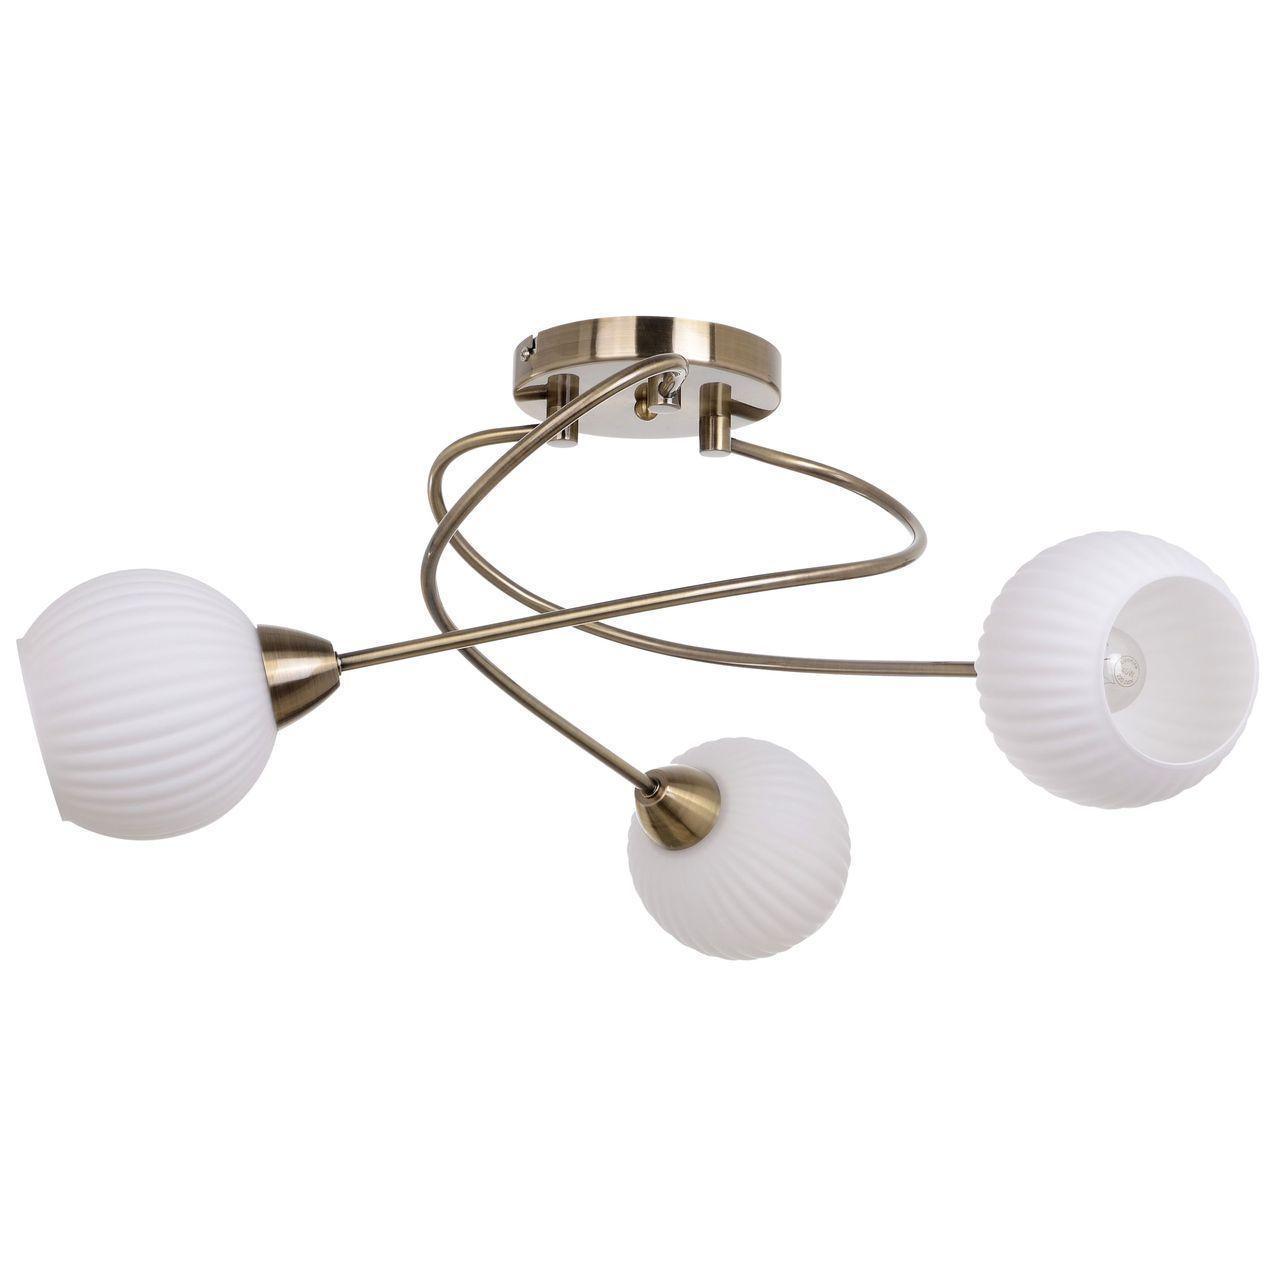 Люстра Spot Light Pavia 8270311 потолочная цены онлайн